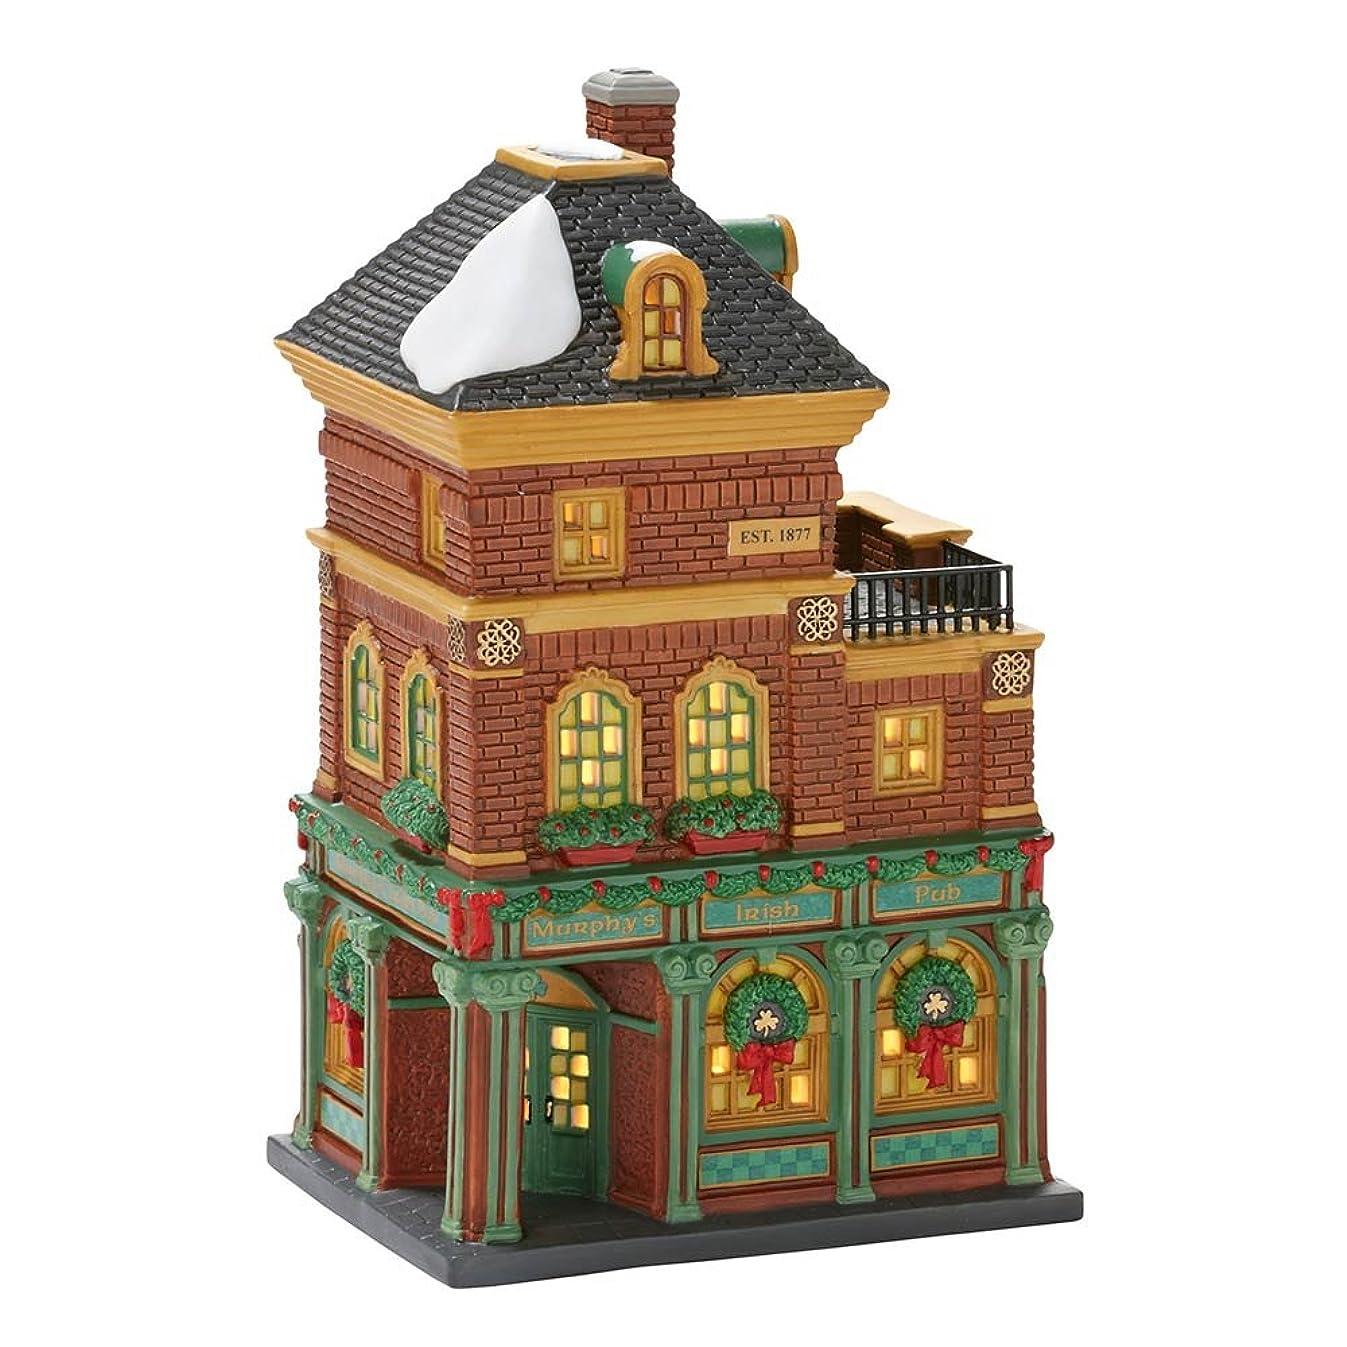 Department 56 Christmas in the City Village Murphy's Irish Pub Lit House